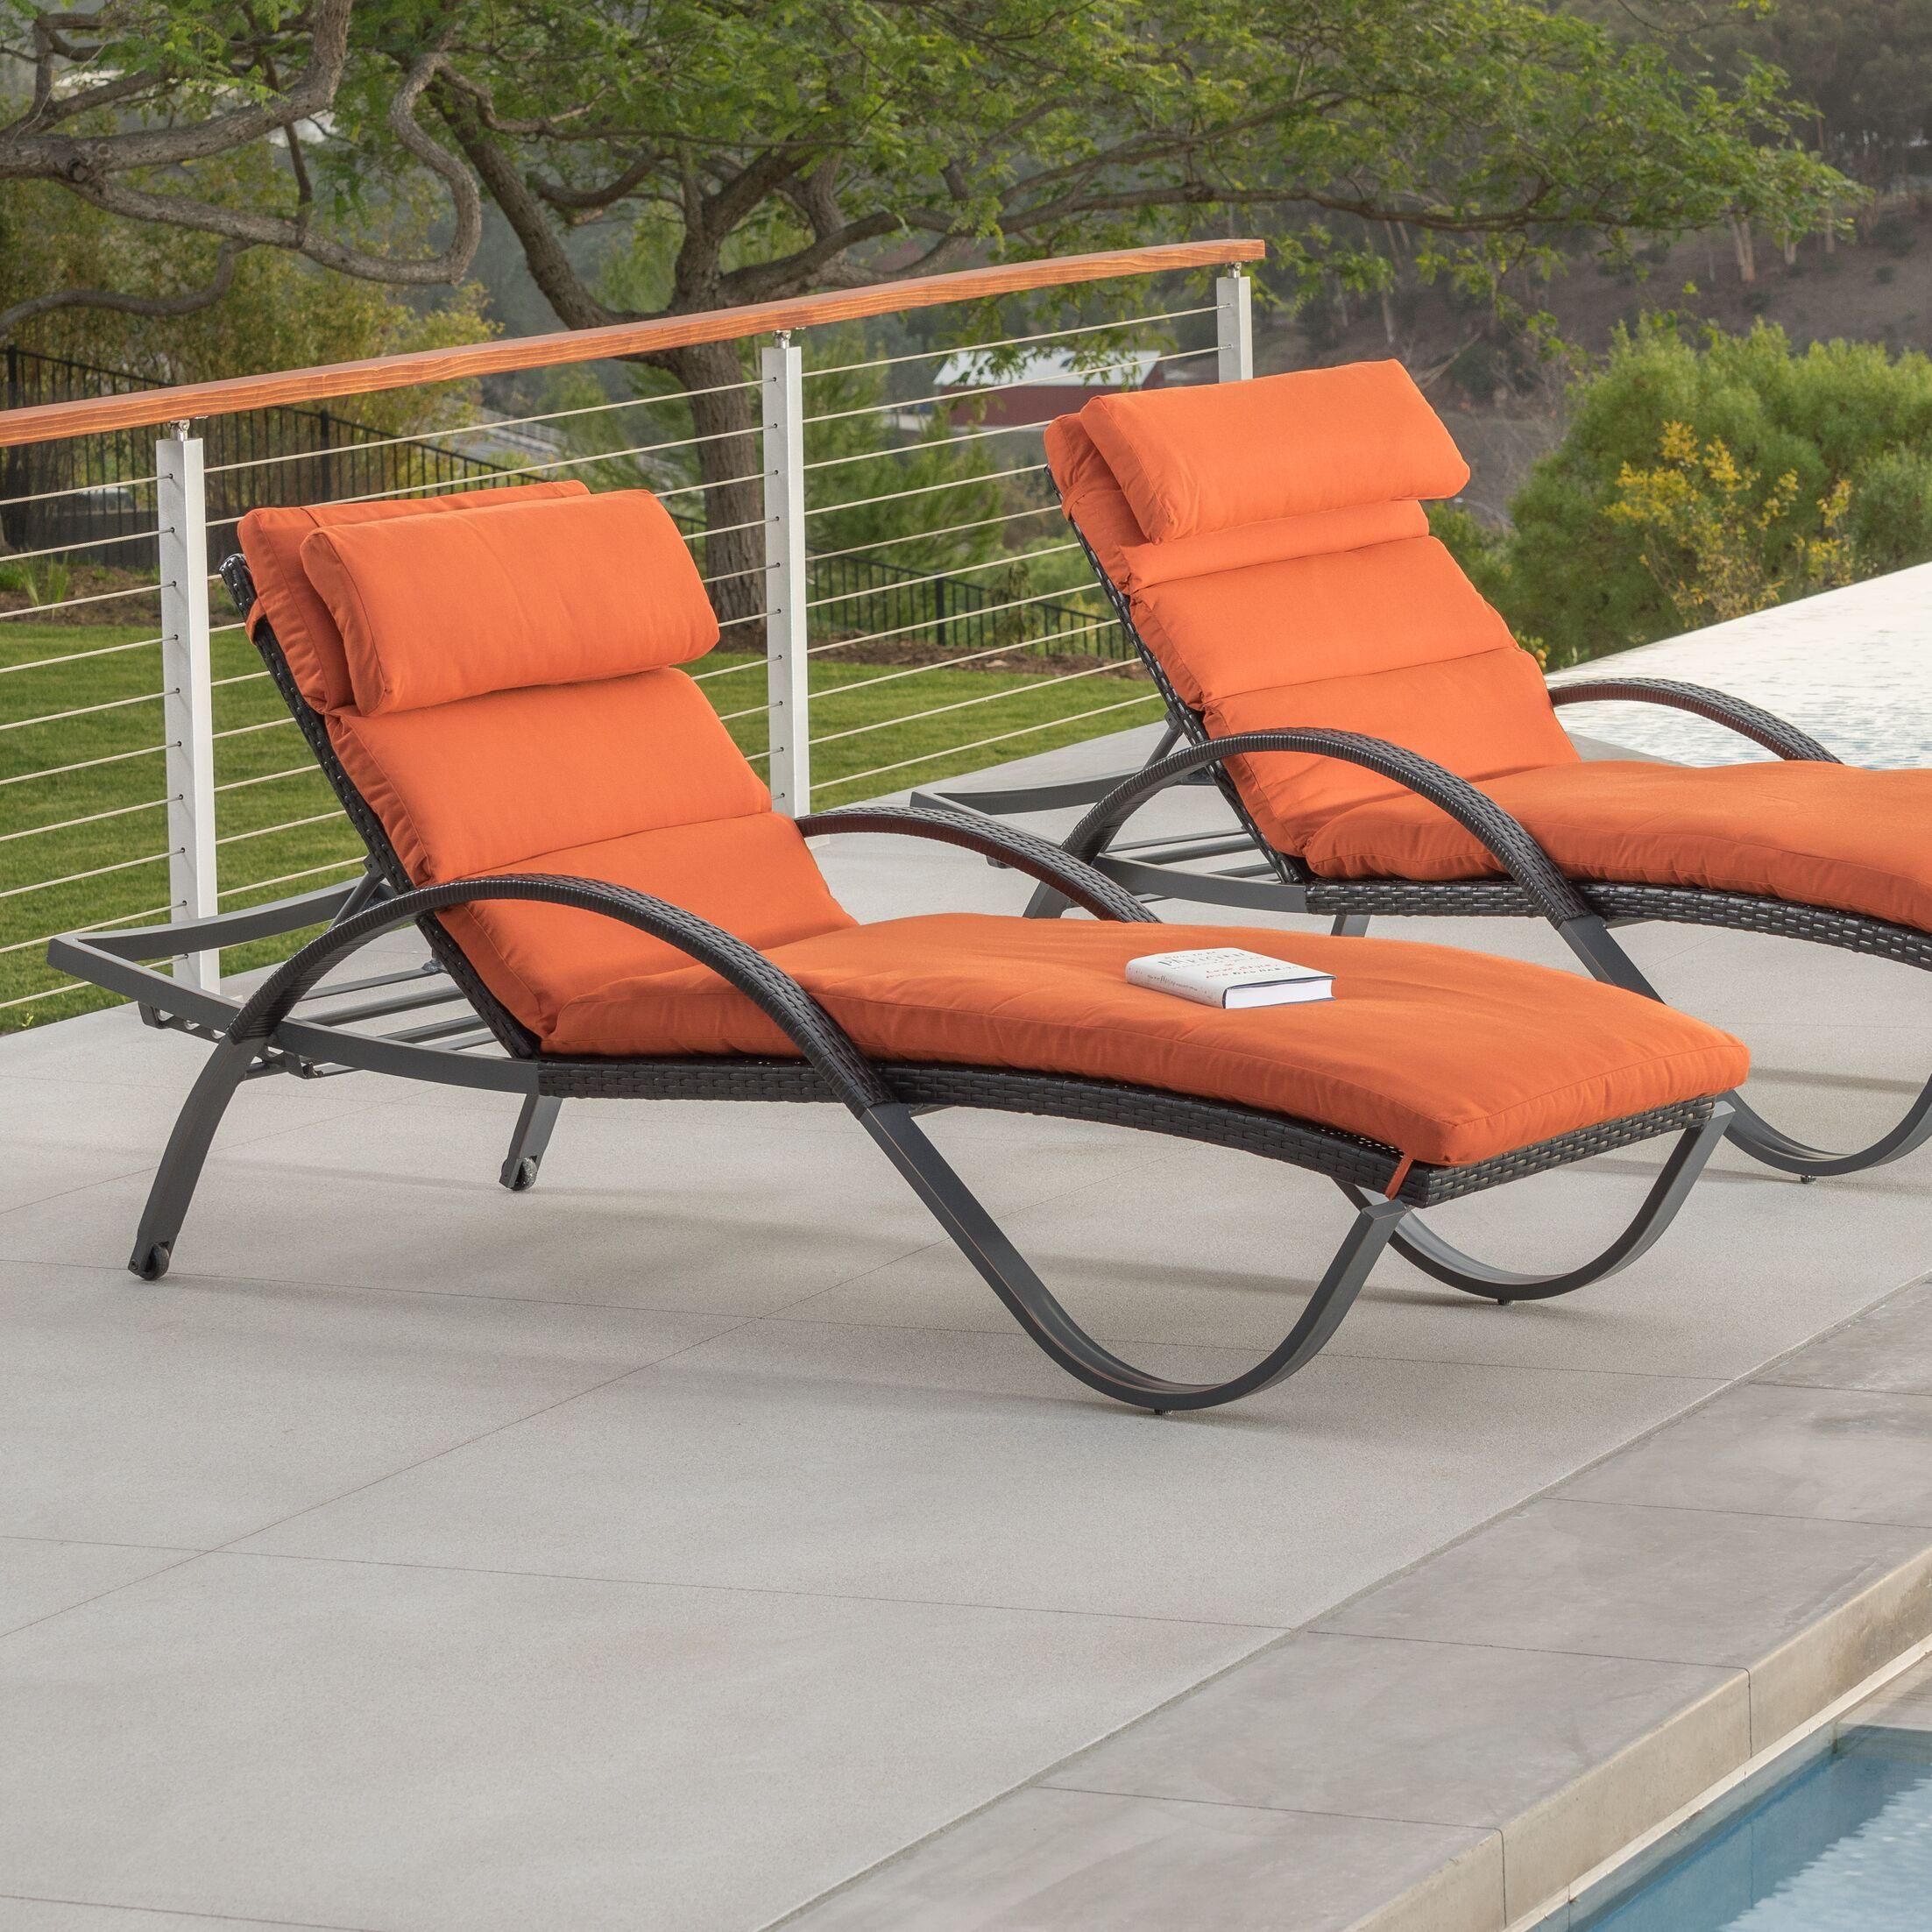 Northridge Chaise Lounge with Cushion Color: Tika Orange